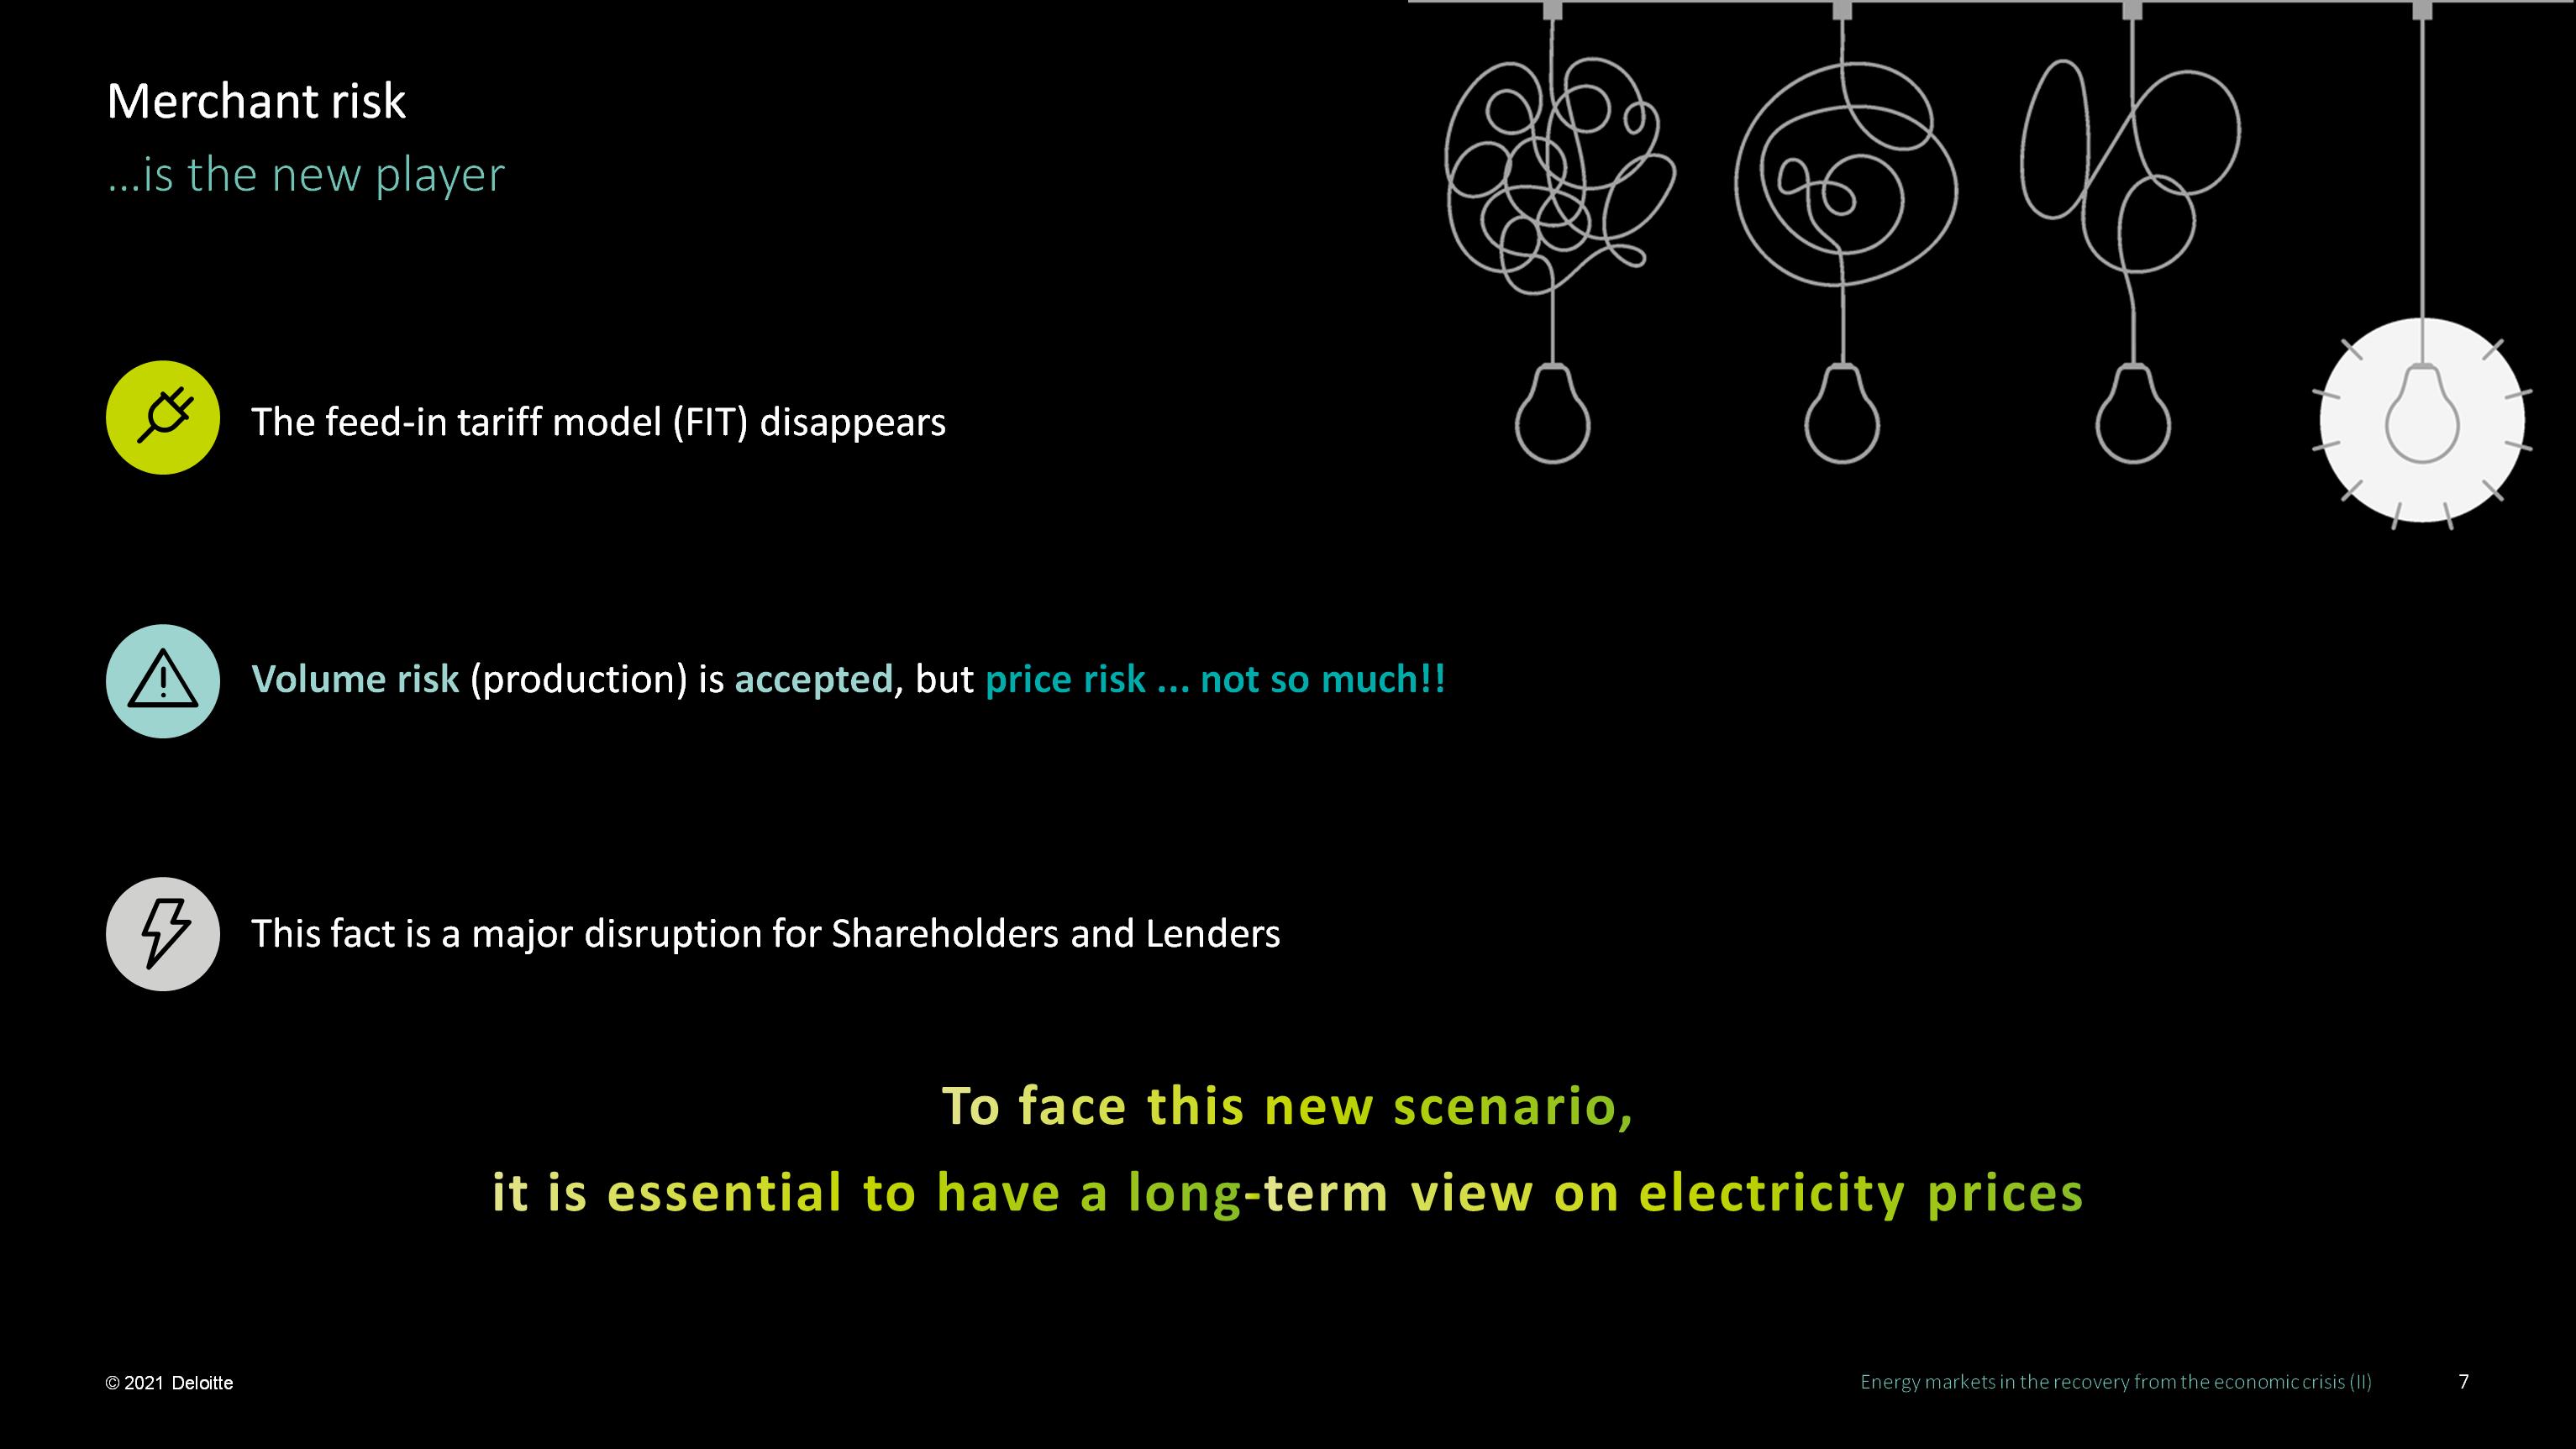 AleaSoft - Deloitte Vision futuro precios mercado electrico